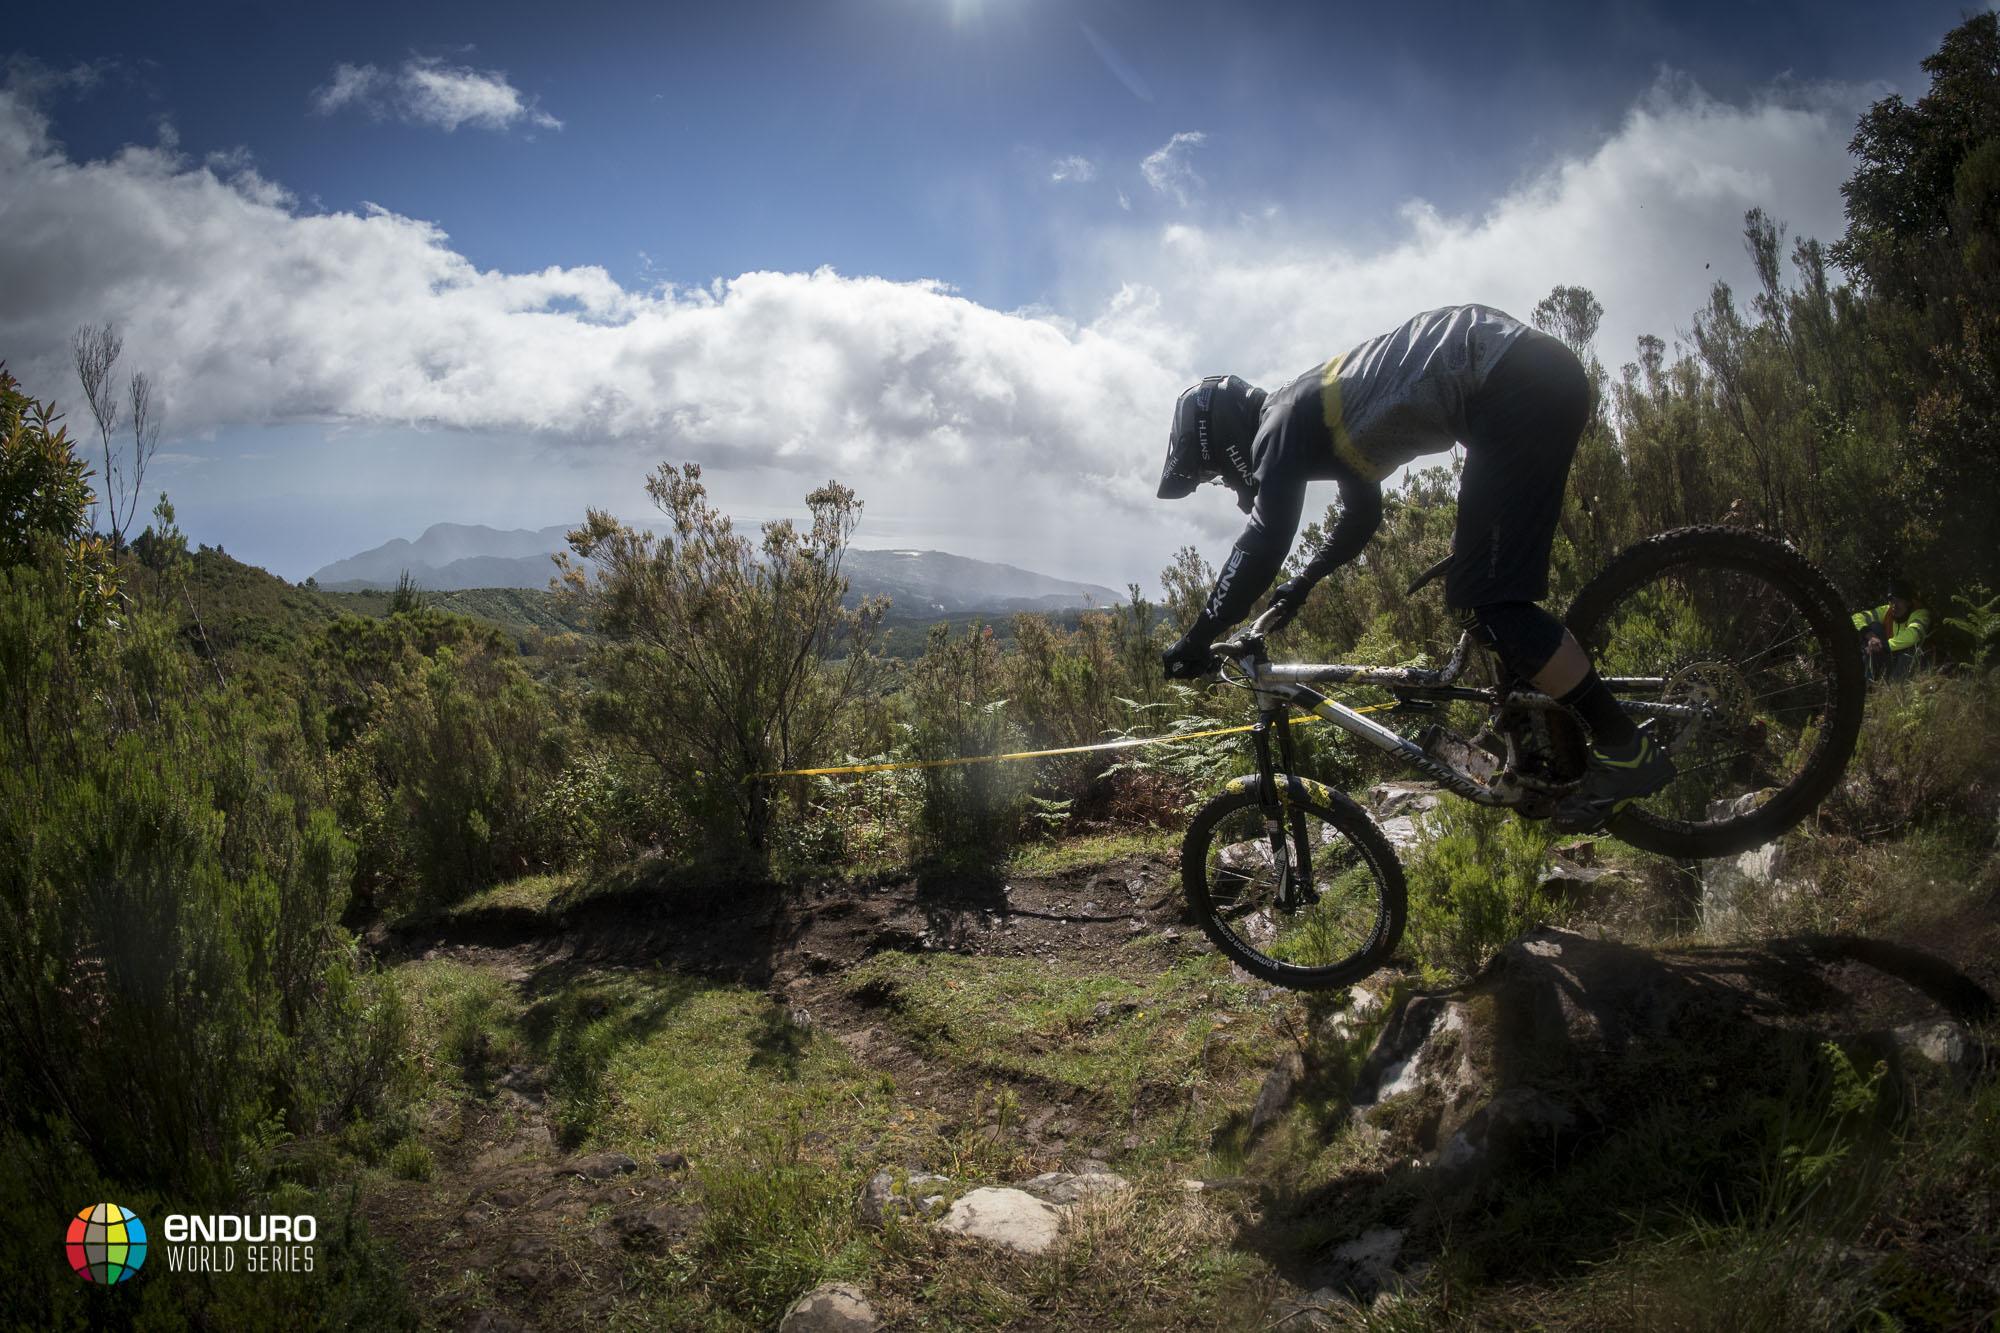 Yoann Barelli enjoying his new bike on stage 2